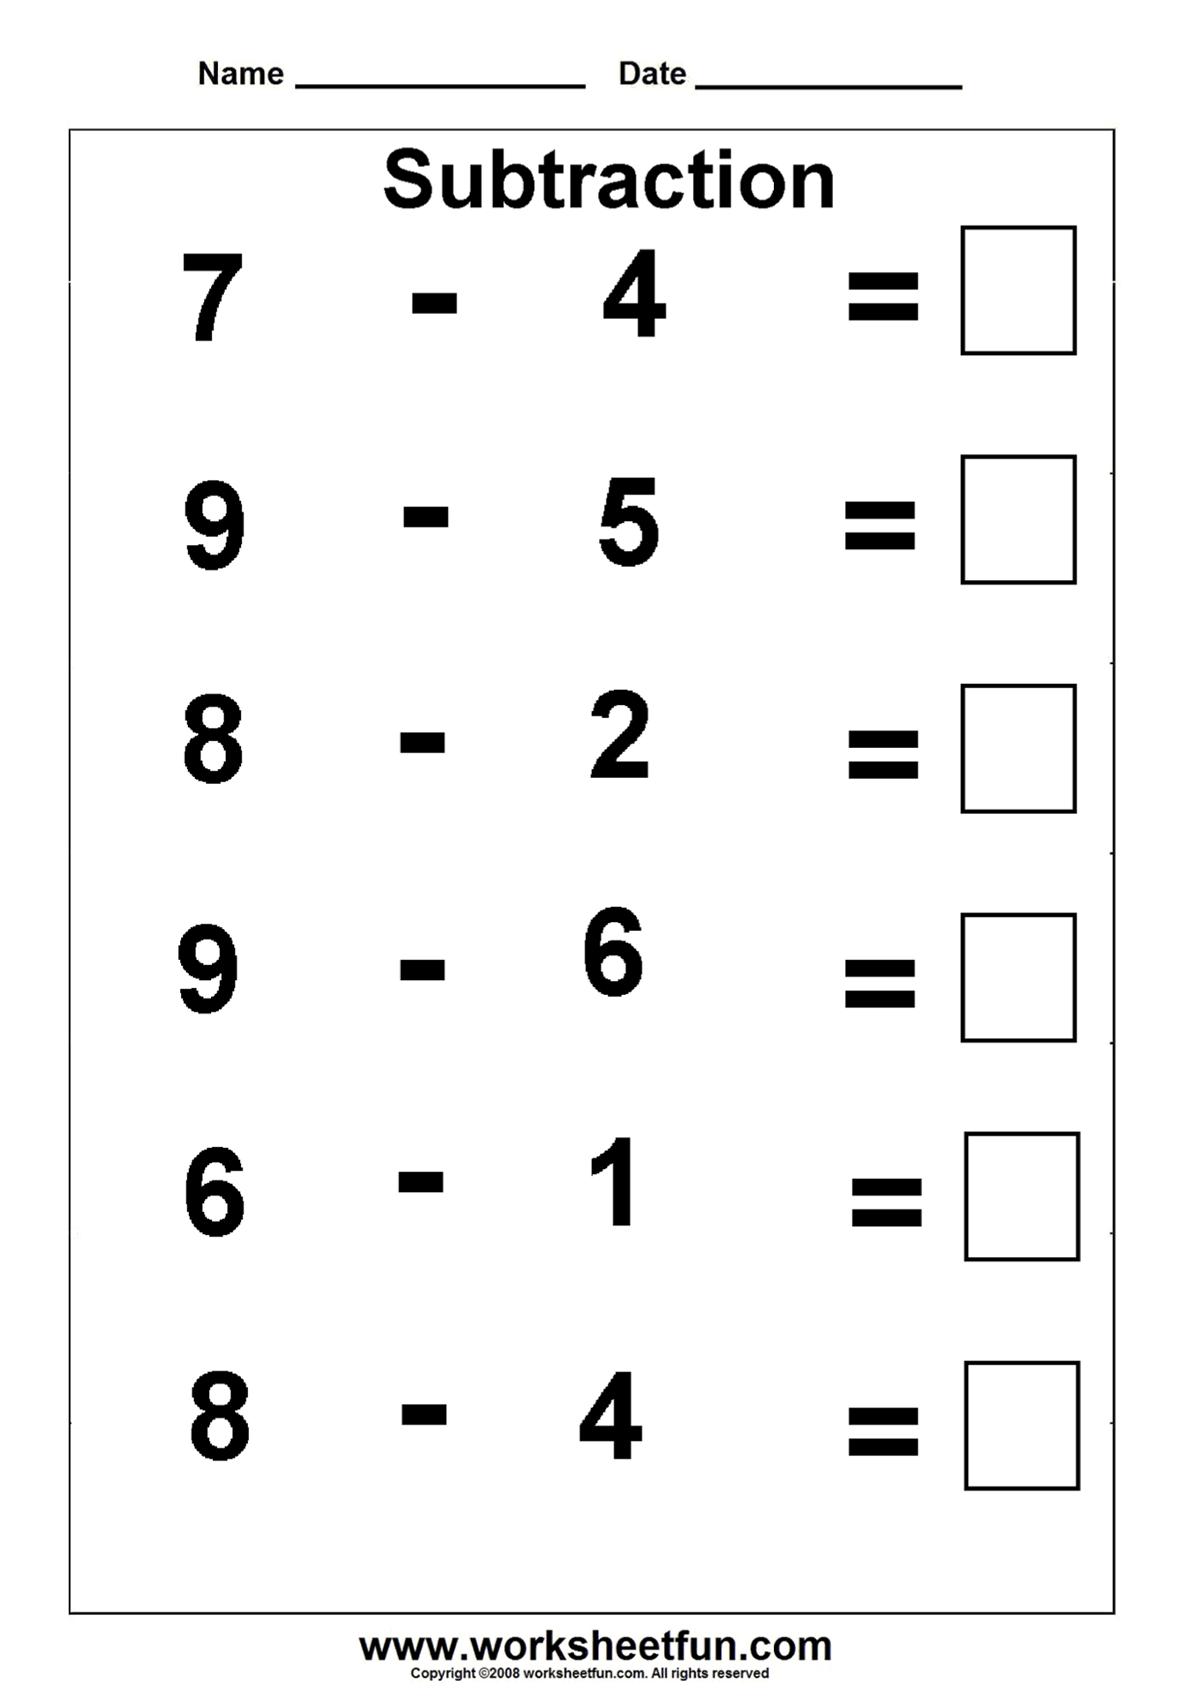 medium resolution of Subtraction worksheet   Kindergarten math worksheets free